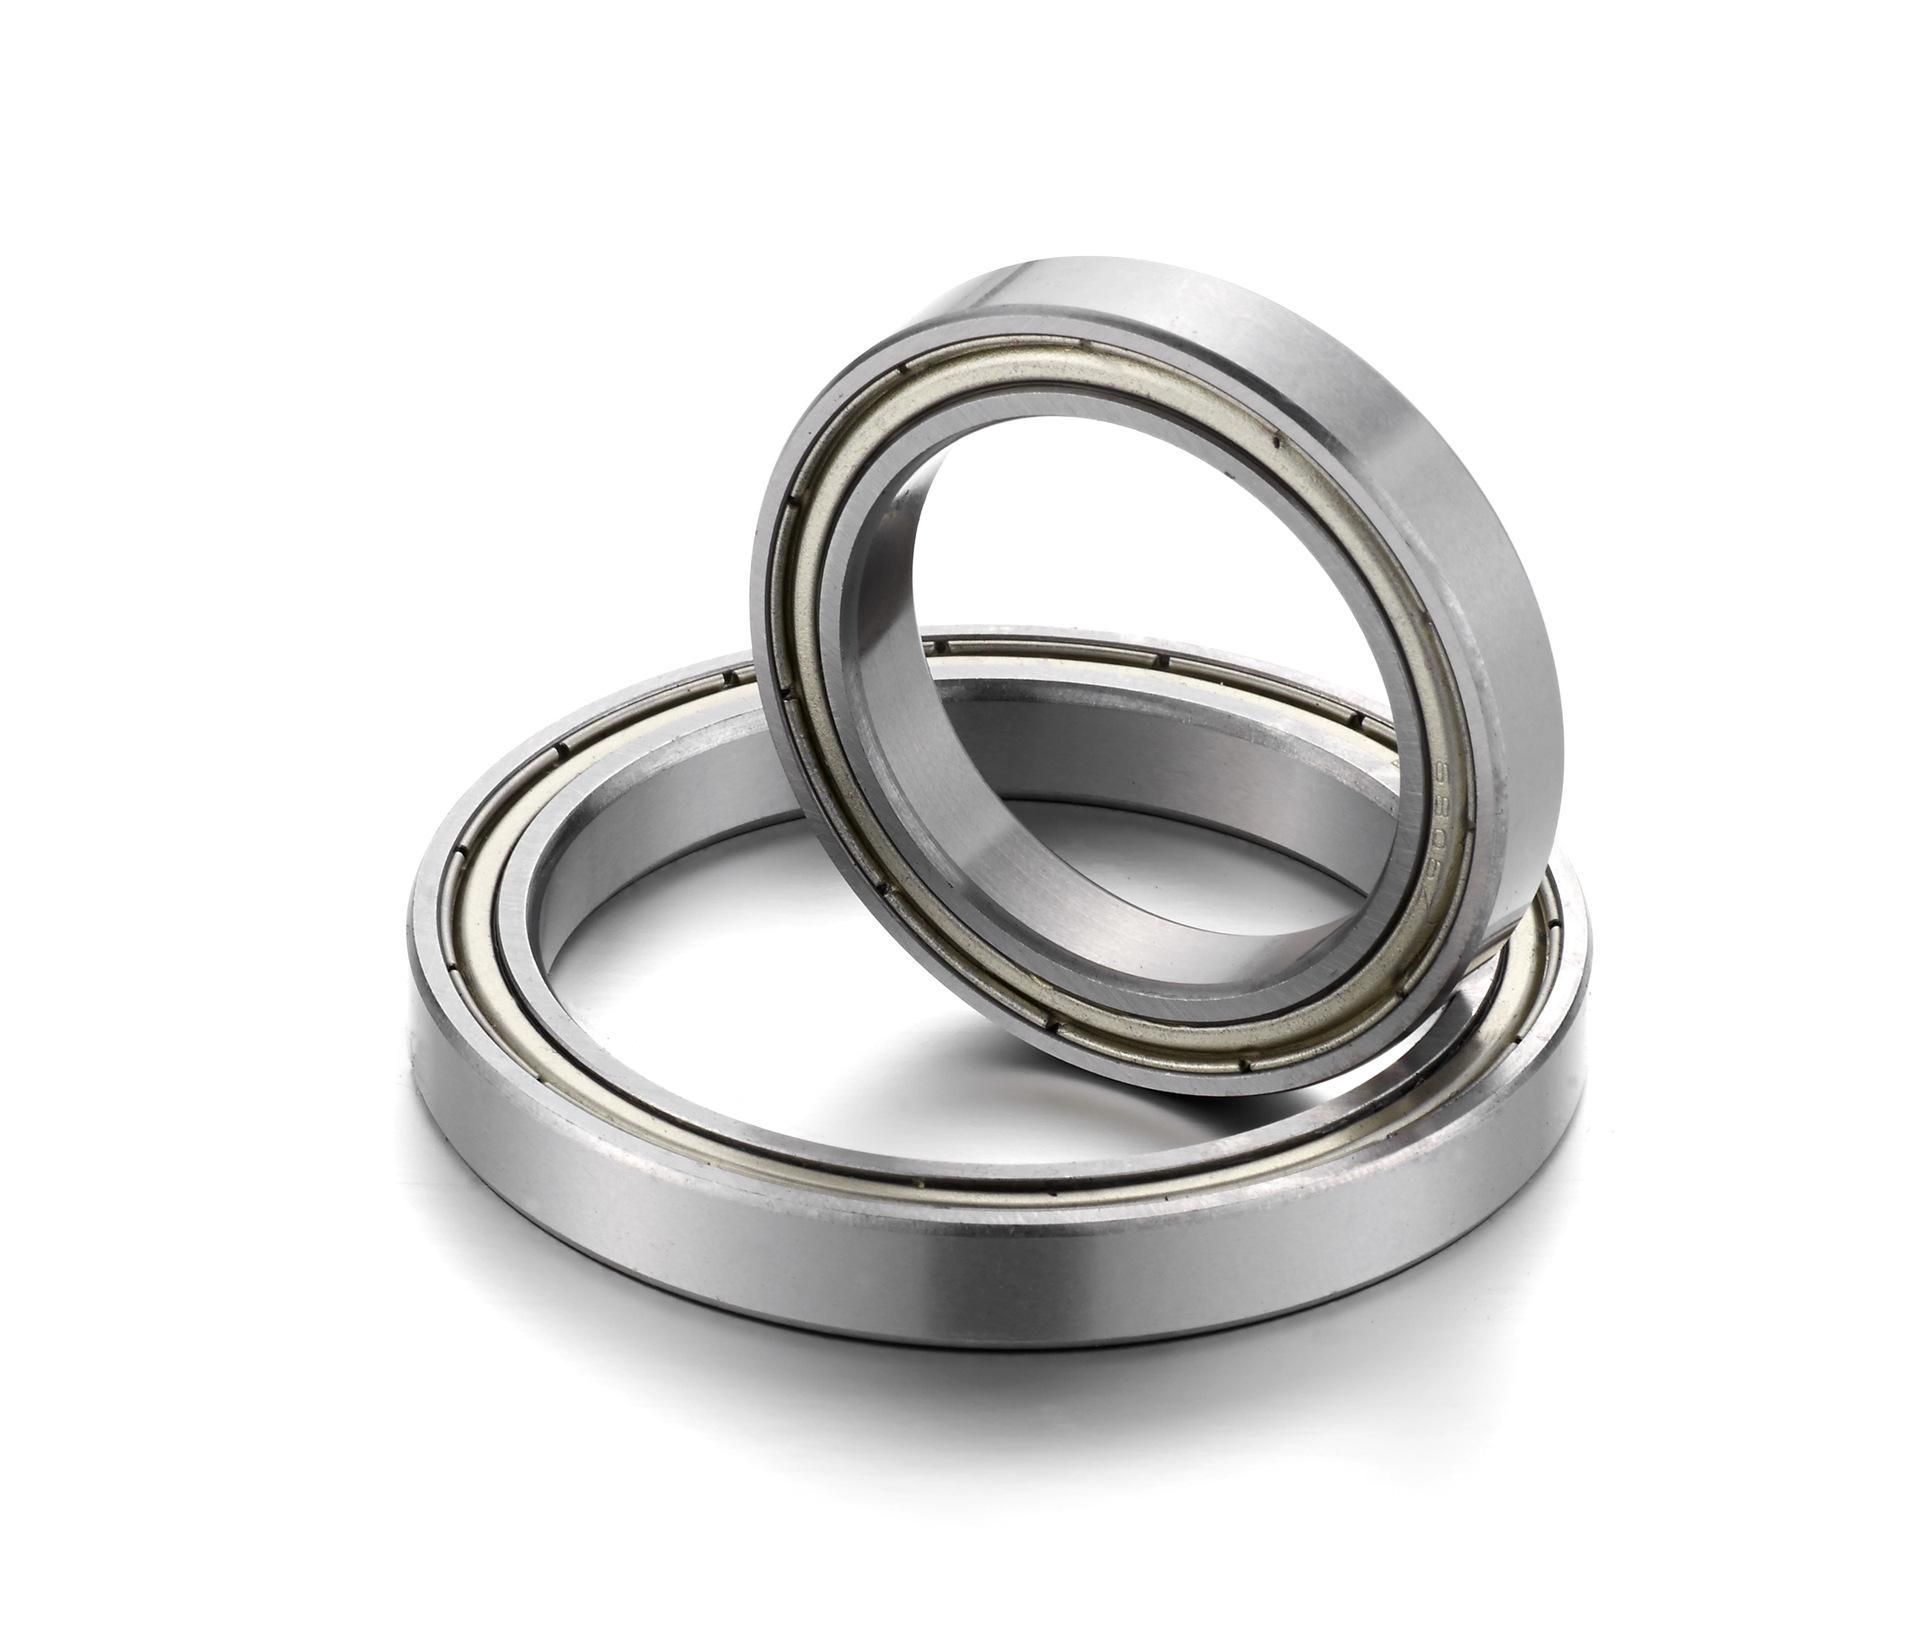 6914ZZ ABEC-1 (2PCS) 70x100x16MM Metric Thin Section Bearings 61914ZZ 6914ZZ 1pcs 71822 71822cd p4 7822 110x140x16 mochu thin walled miniature angular contact bearings speed spindle bearings cnc abec 7